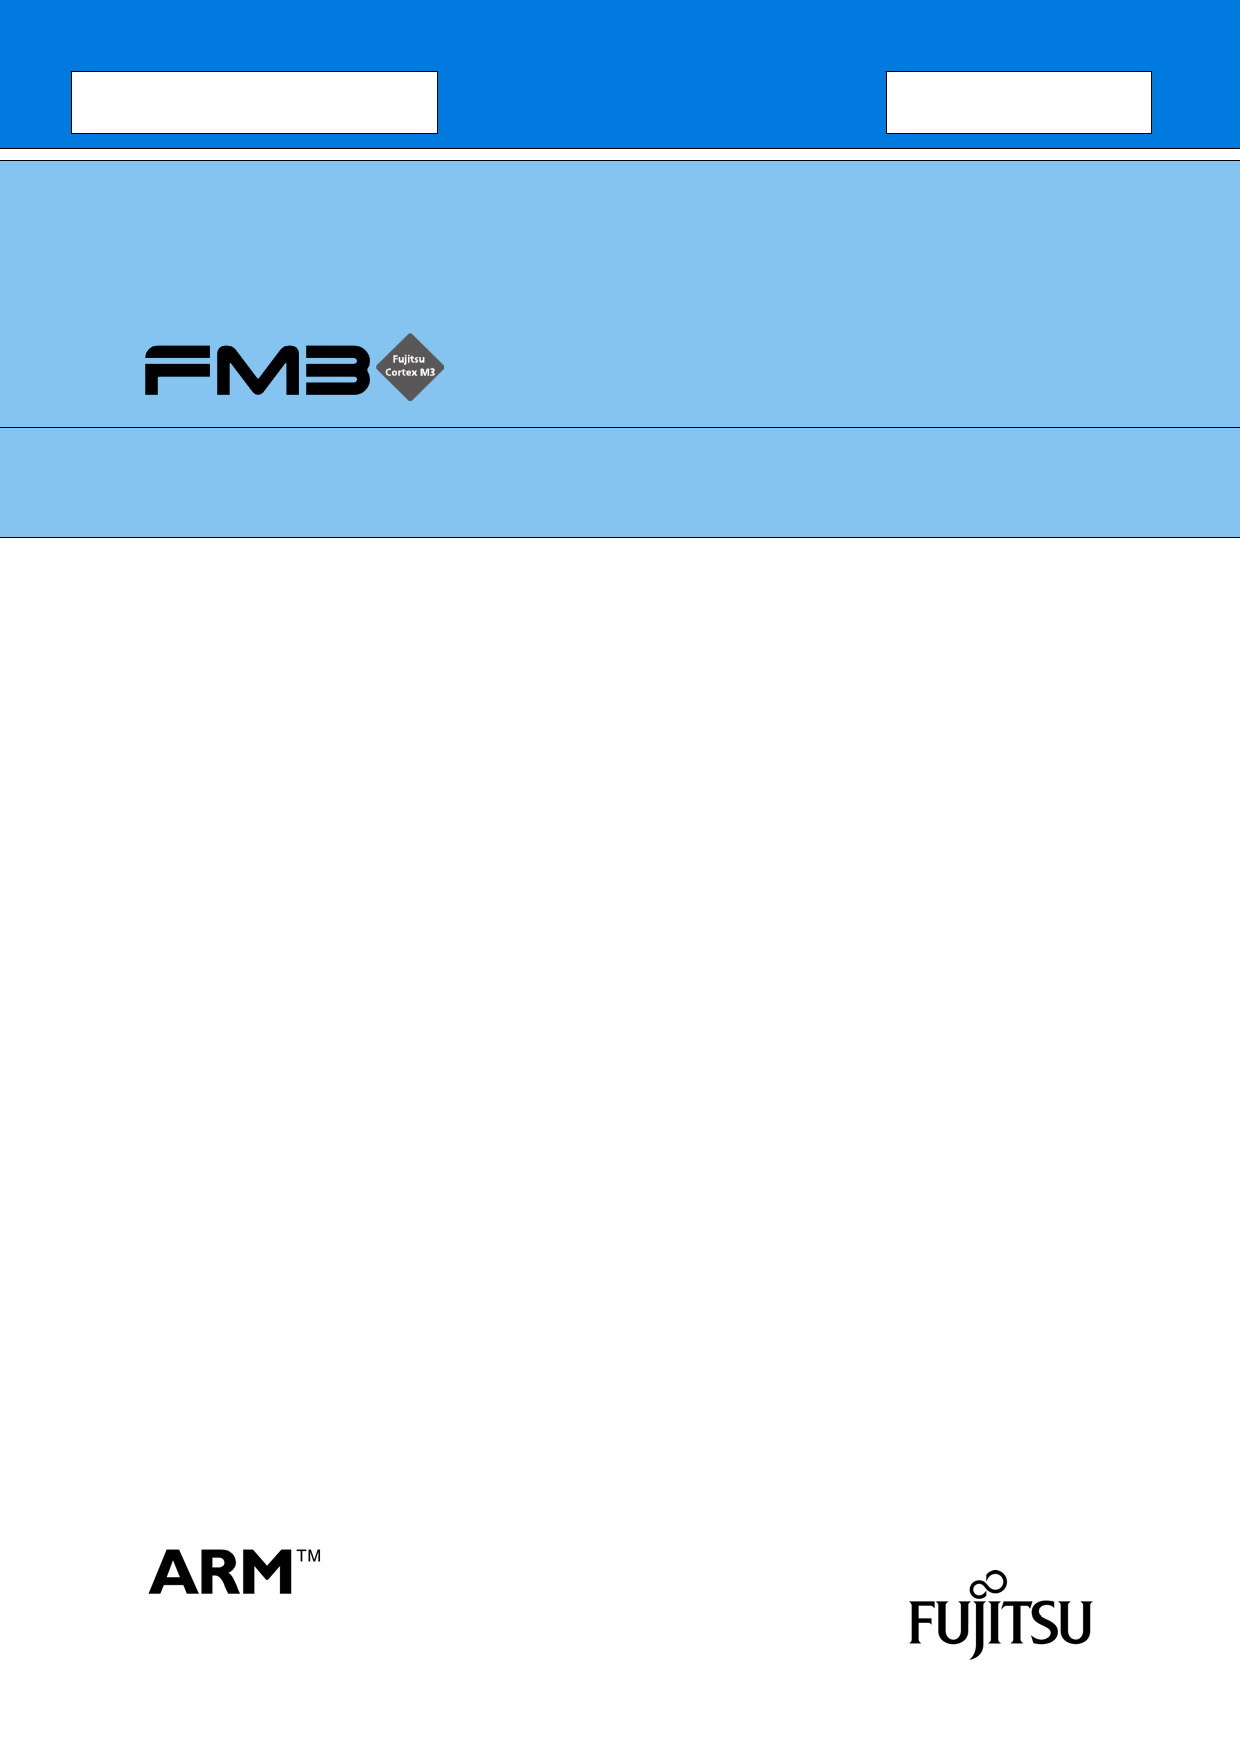 MB9BF324L 데이터시트 및 MB9BF324L PDF